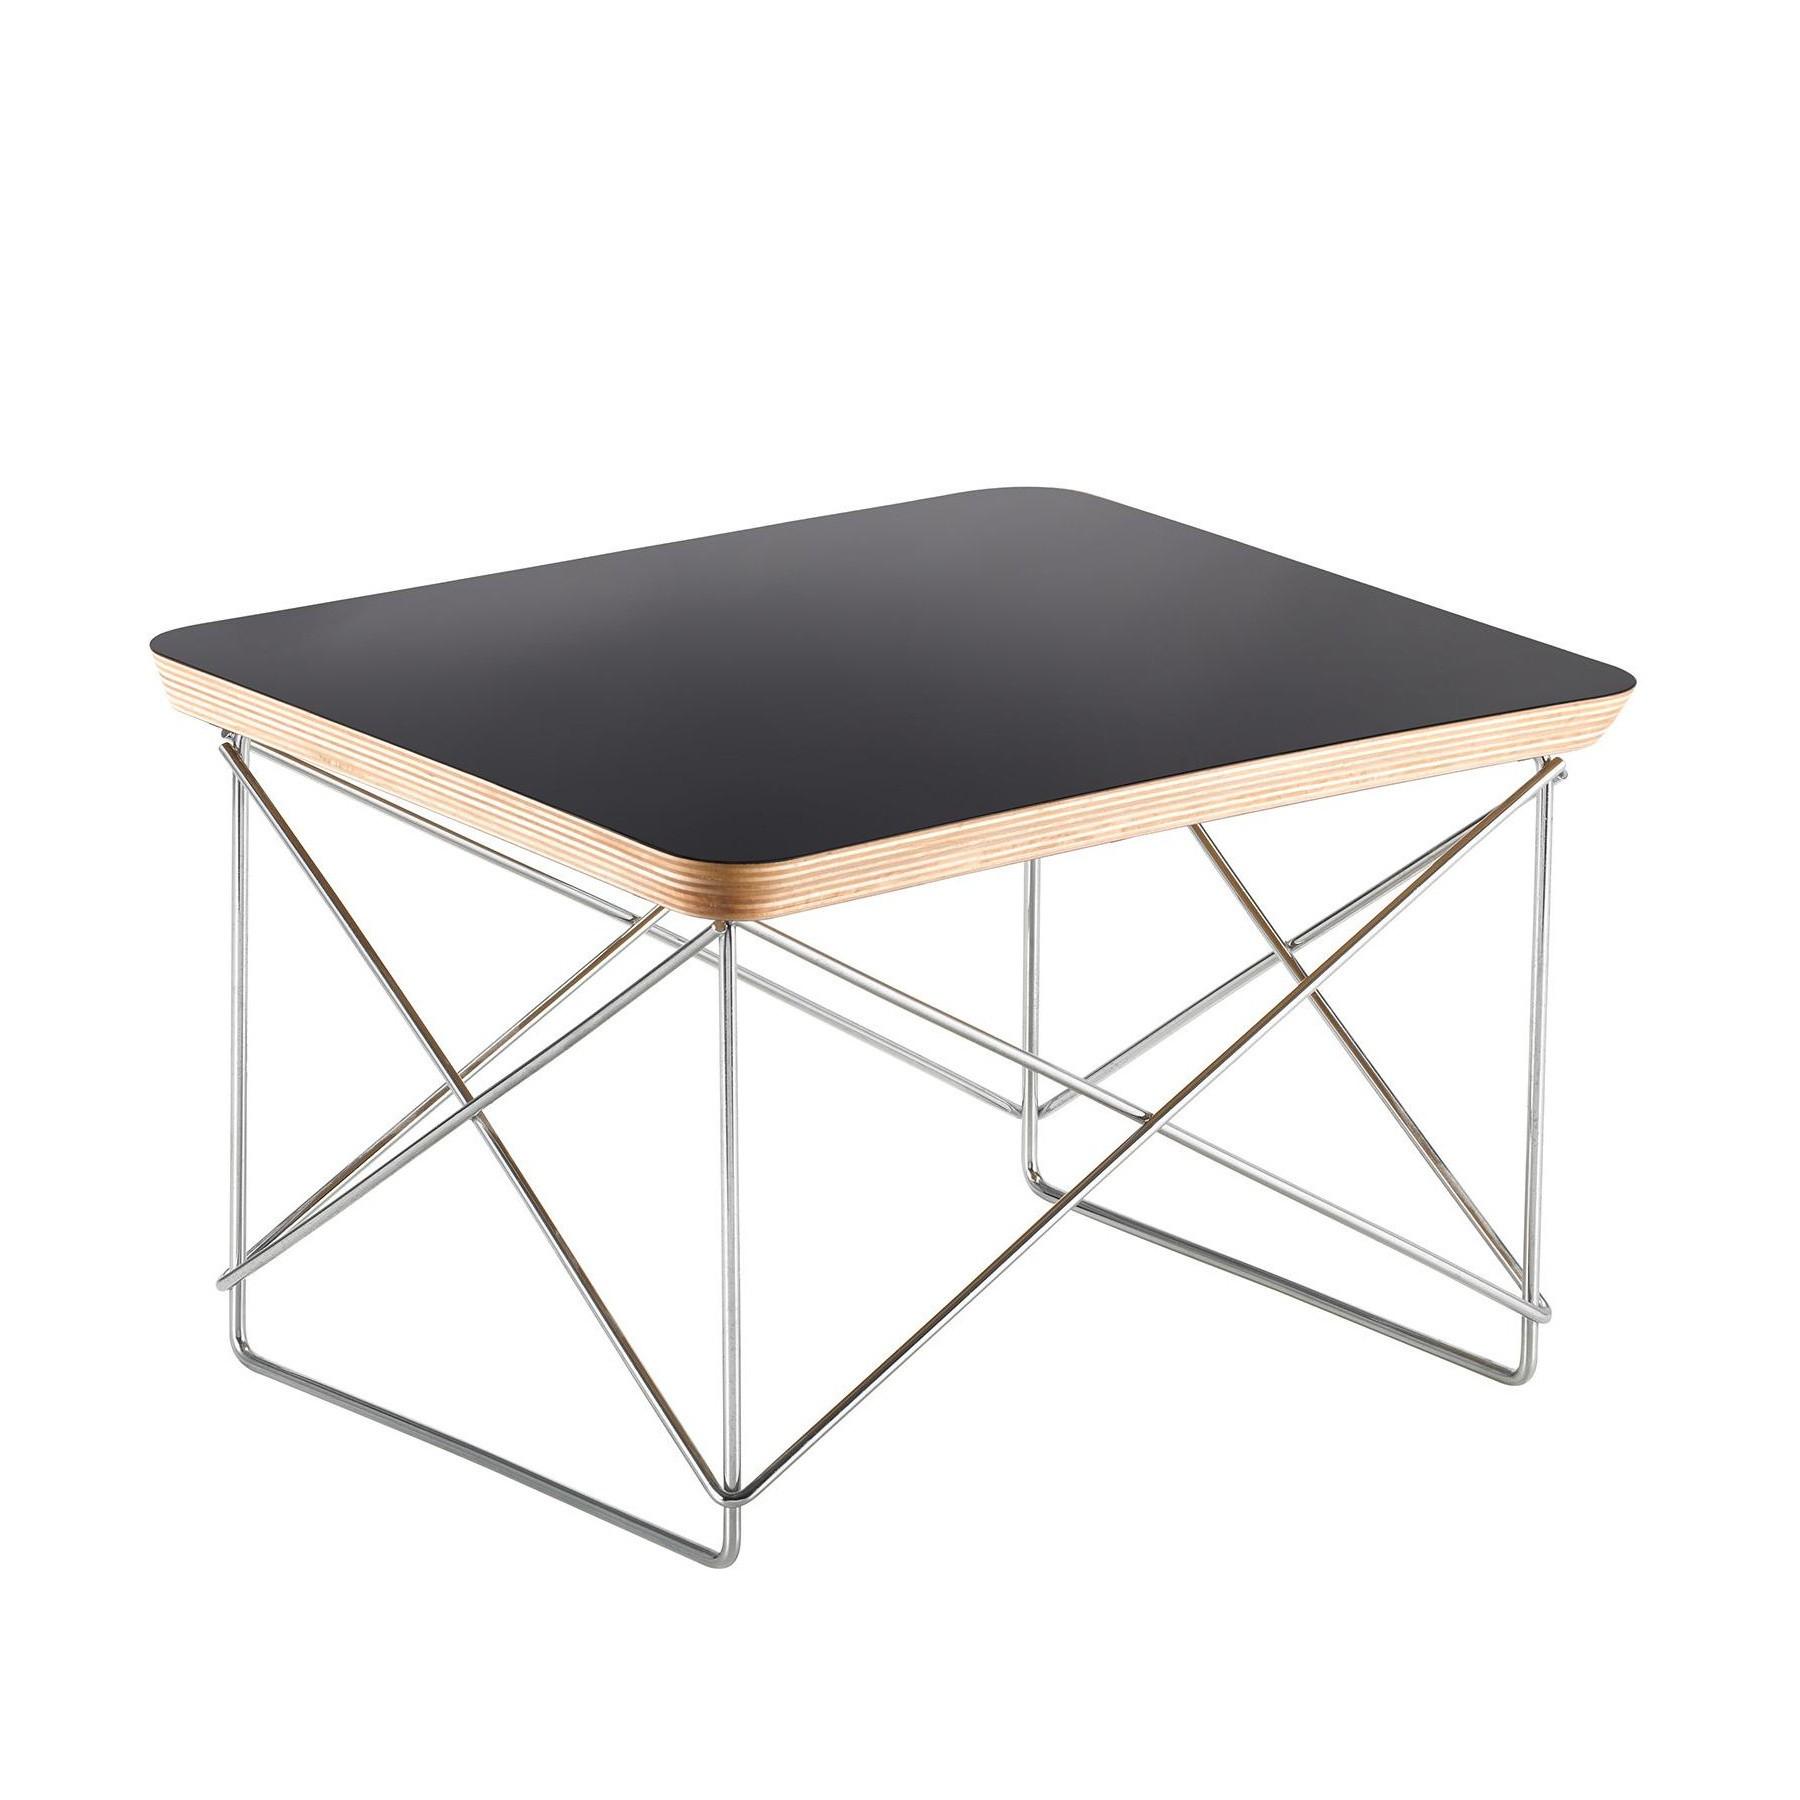 Vitra Occasional Table Ltr Beistelltisch Ambientedirect